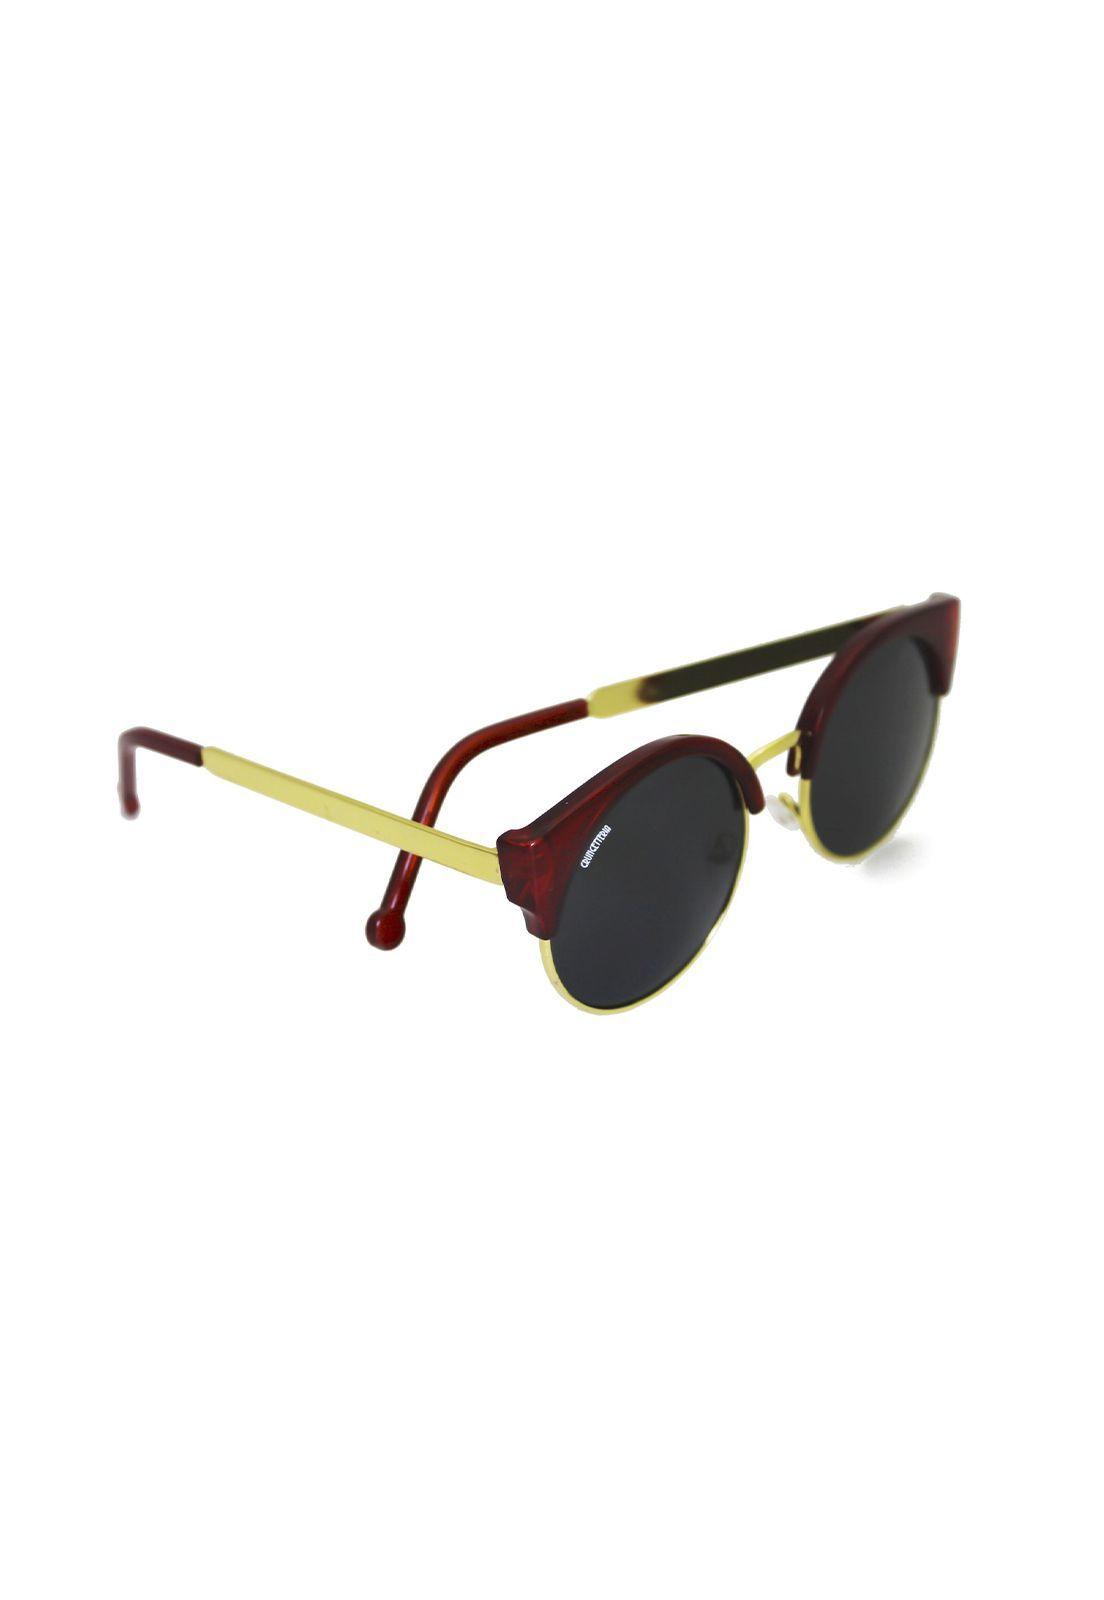 Óculos de Sol Grungetteria Miss Kitty Vinho